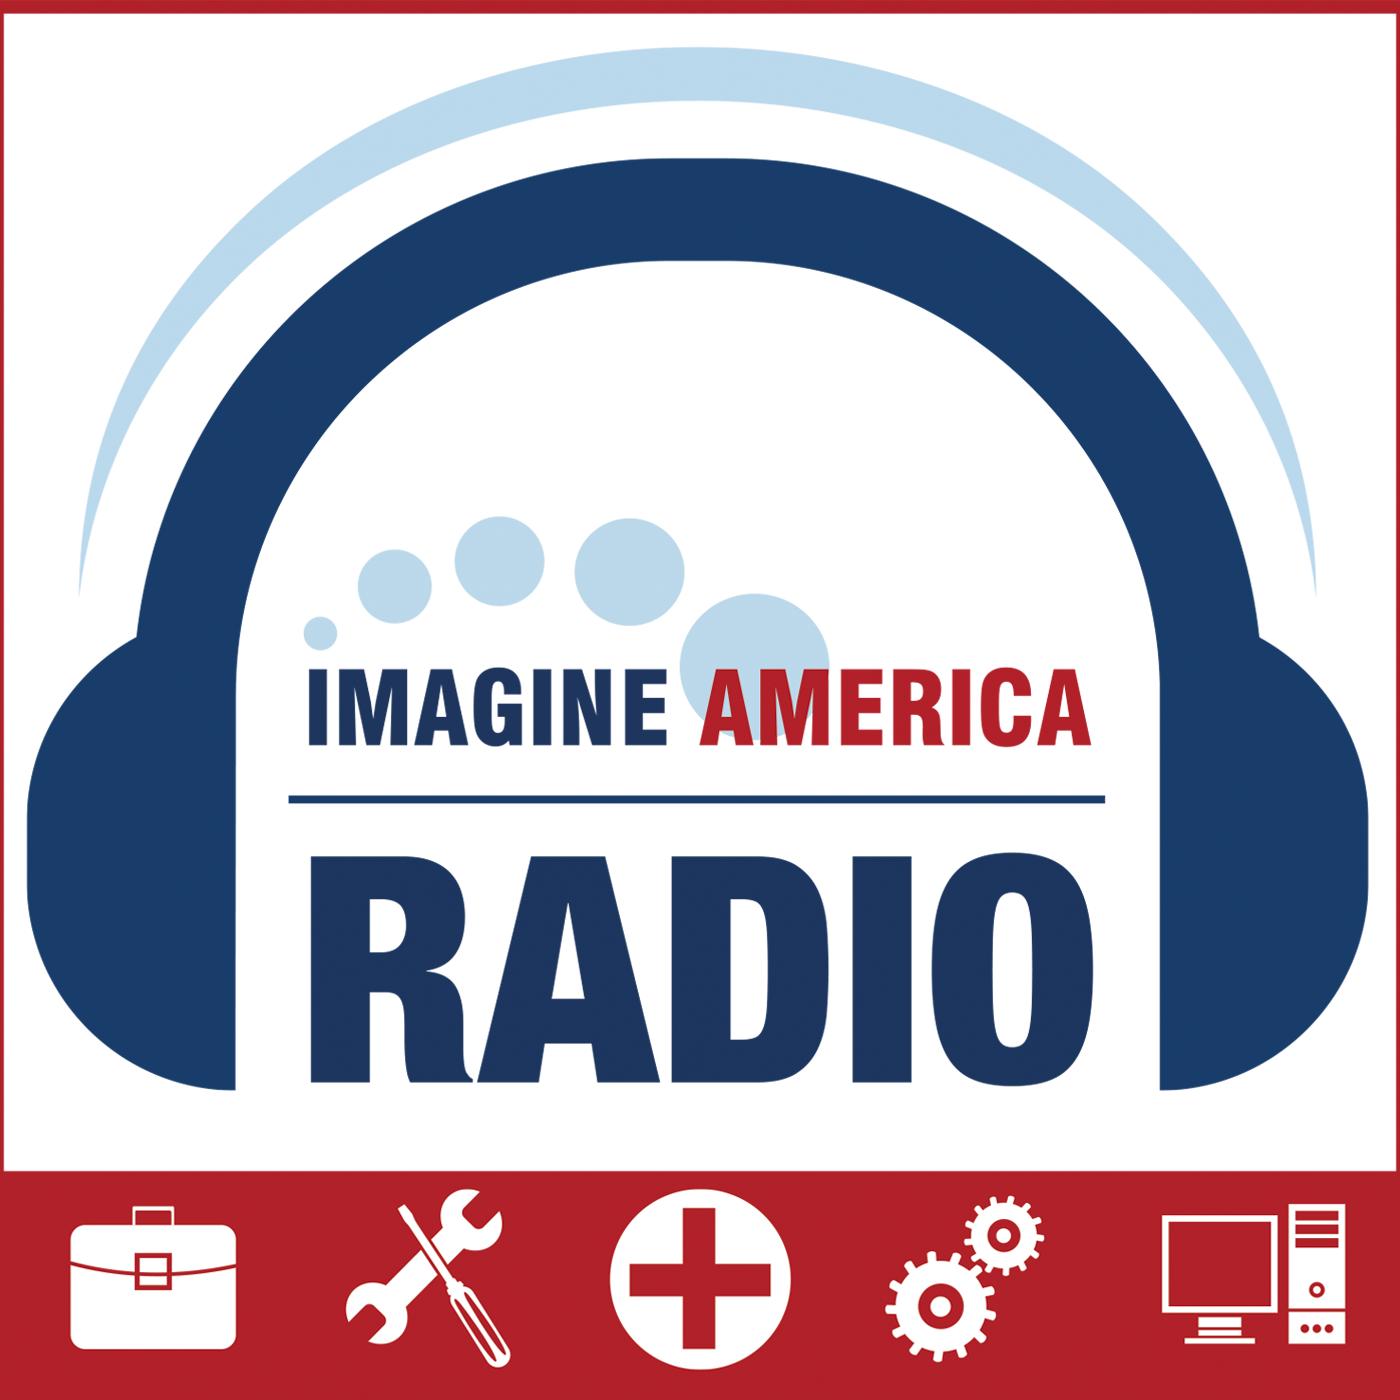 Imagine America Radio show art